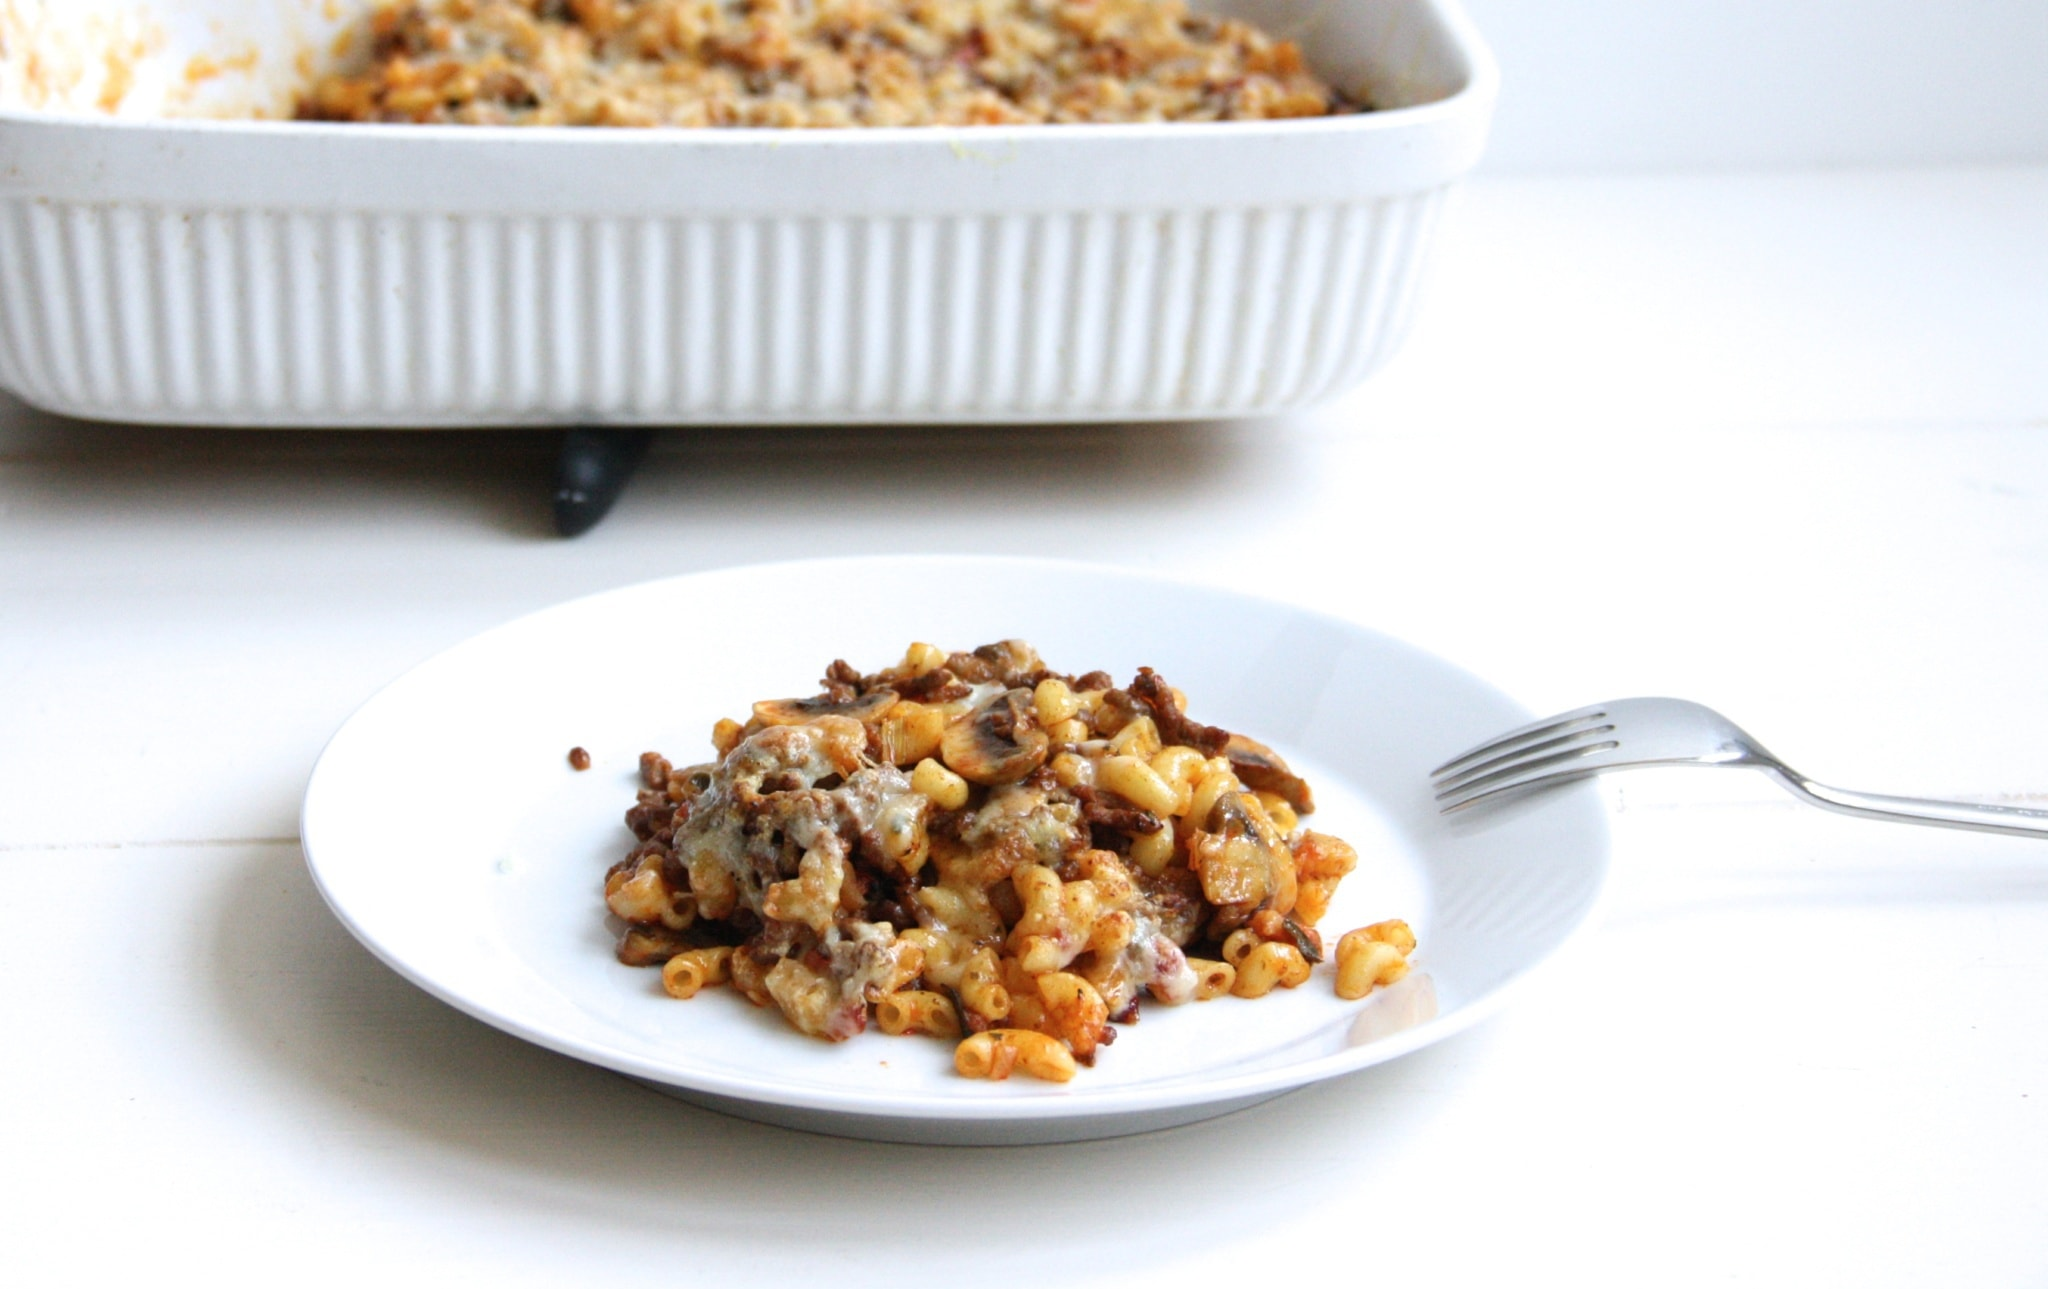 macaronischotel, macaroni, ovenschotel